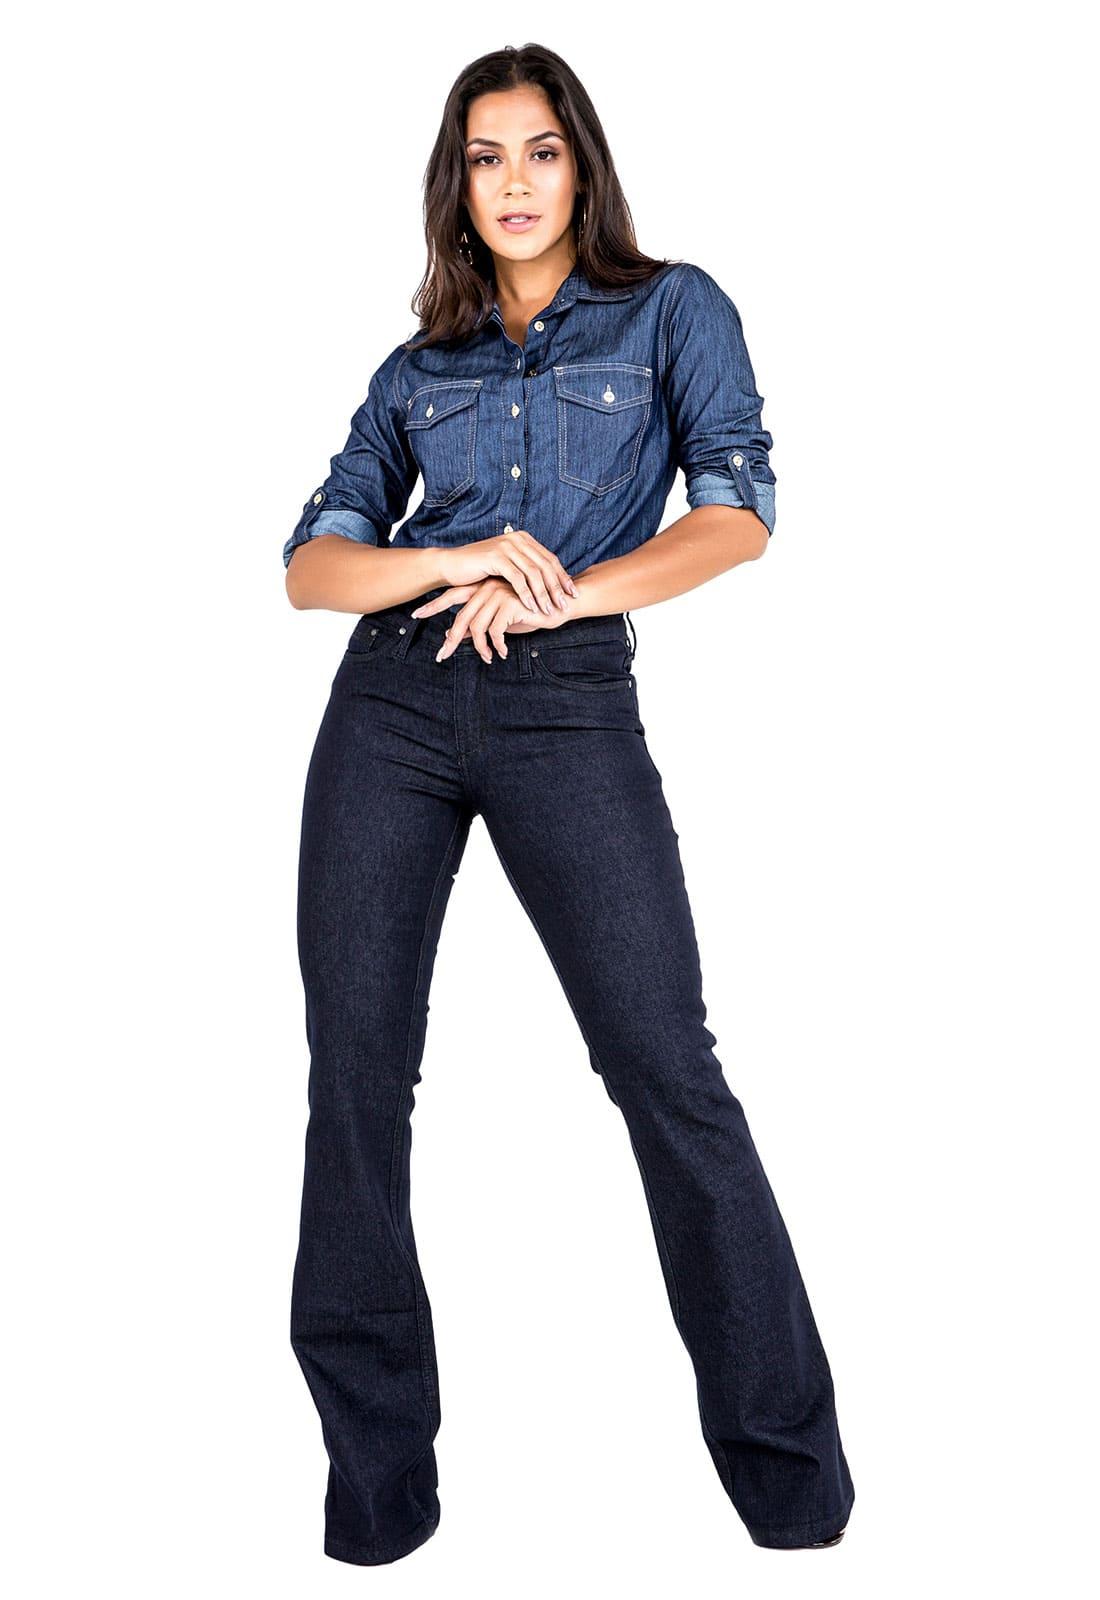 Calça Feminina Flare Tradicional Jeans